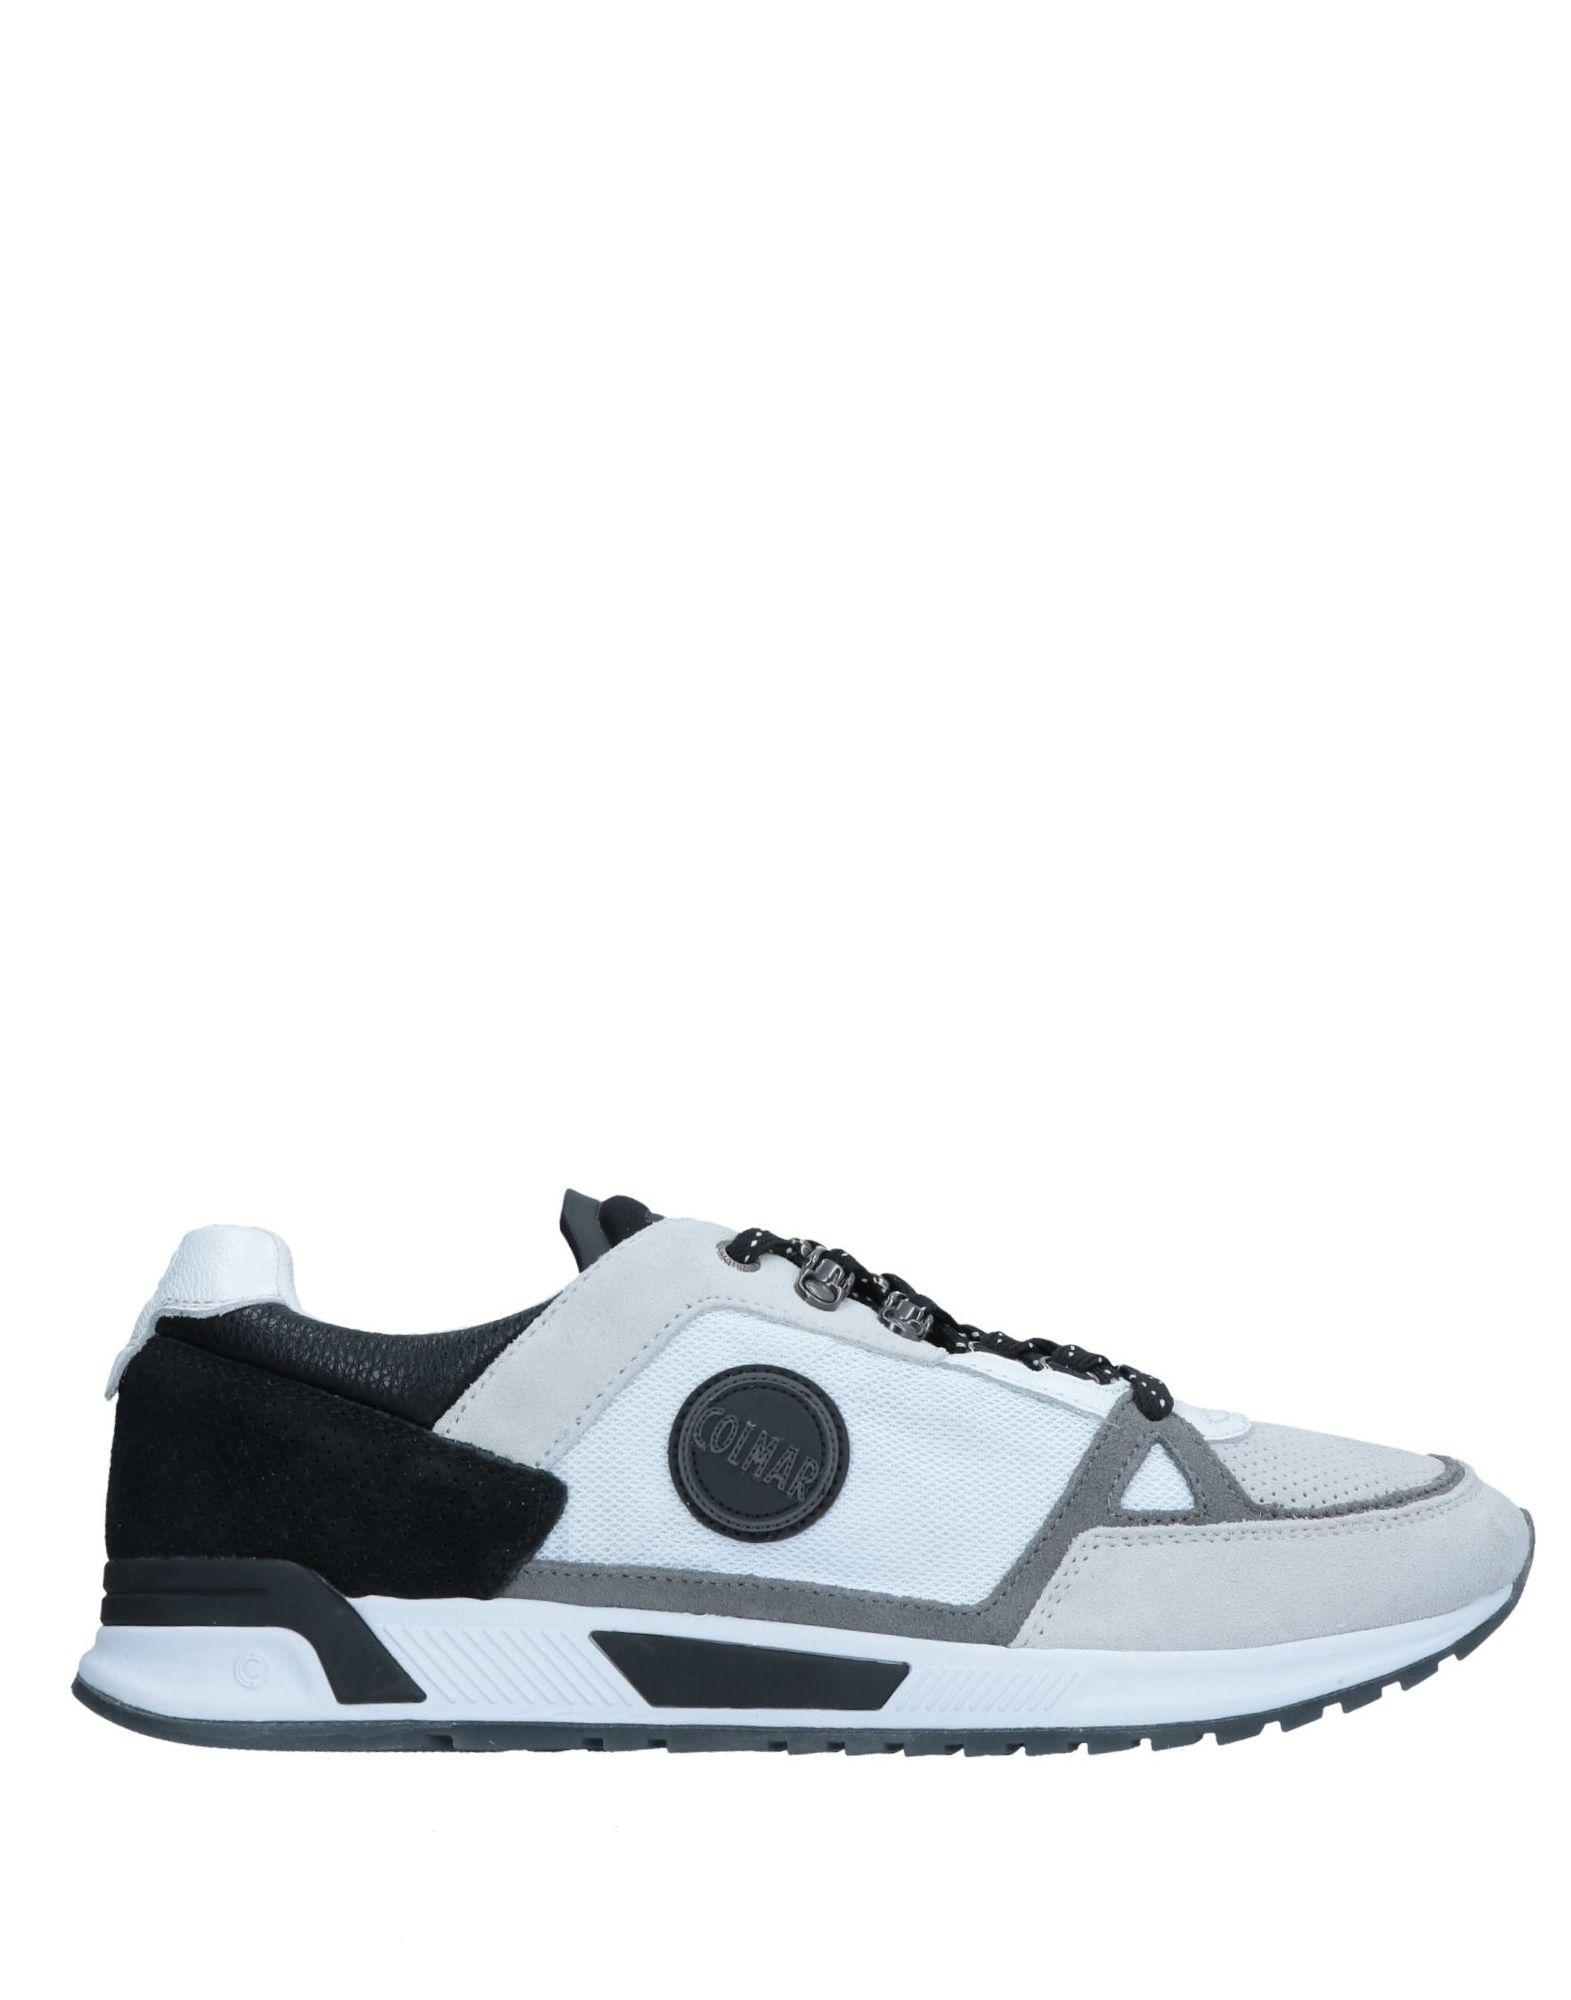 Rabatt echte Schuhe 11546481CG Colmar Sneakers Herren  11546481CG Schuhe e4a409